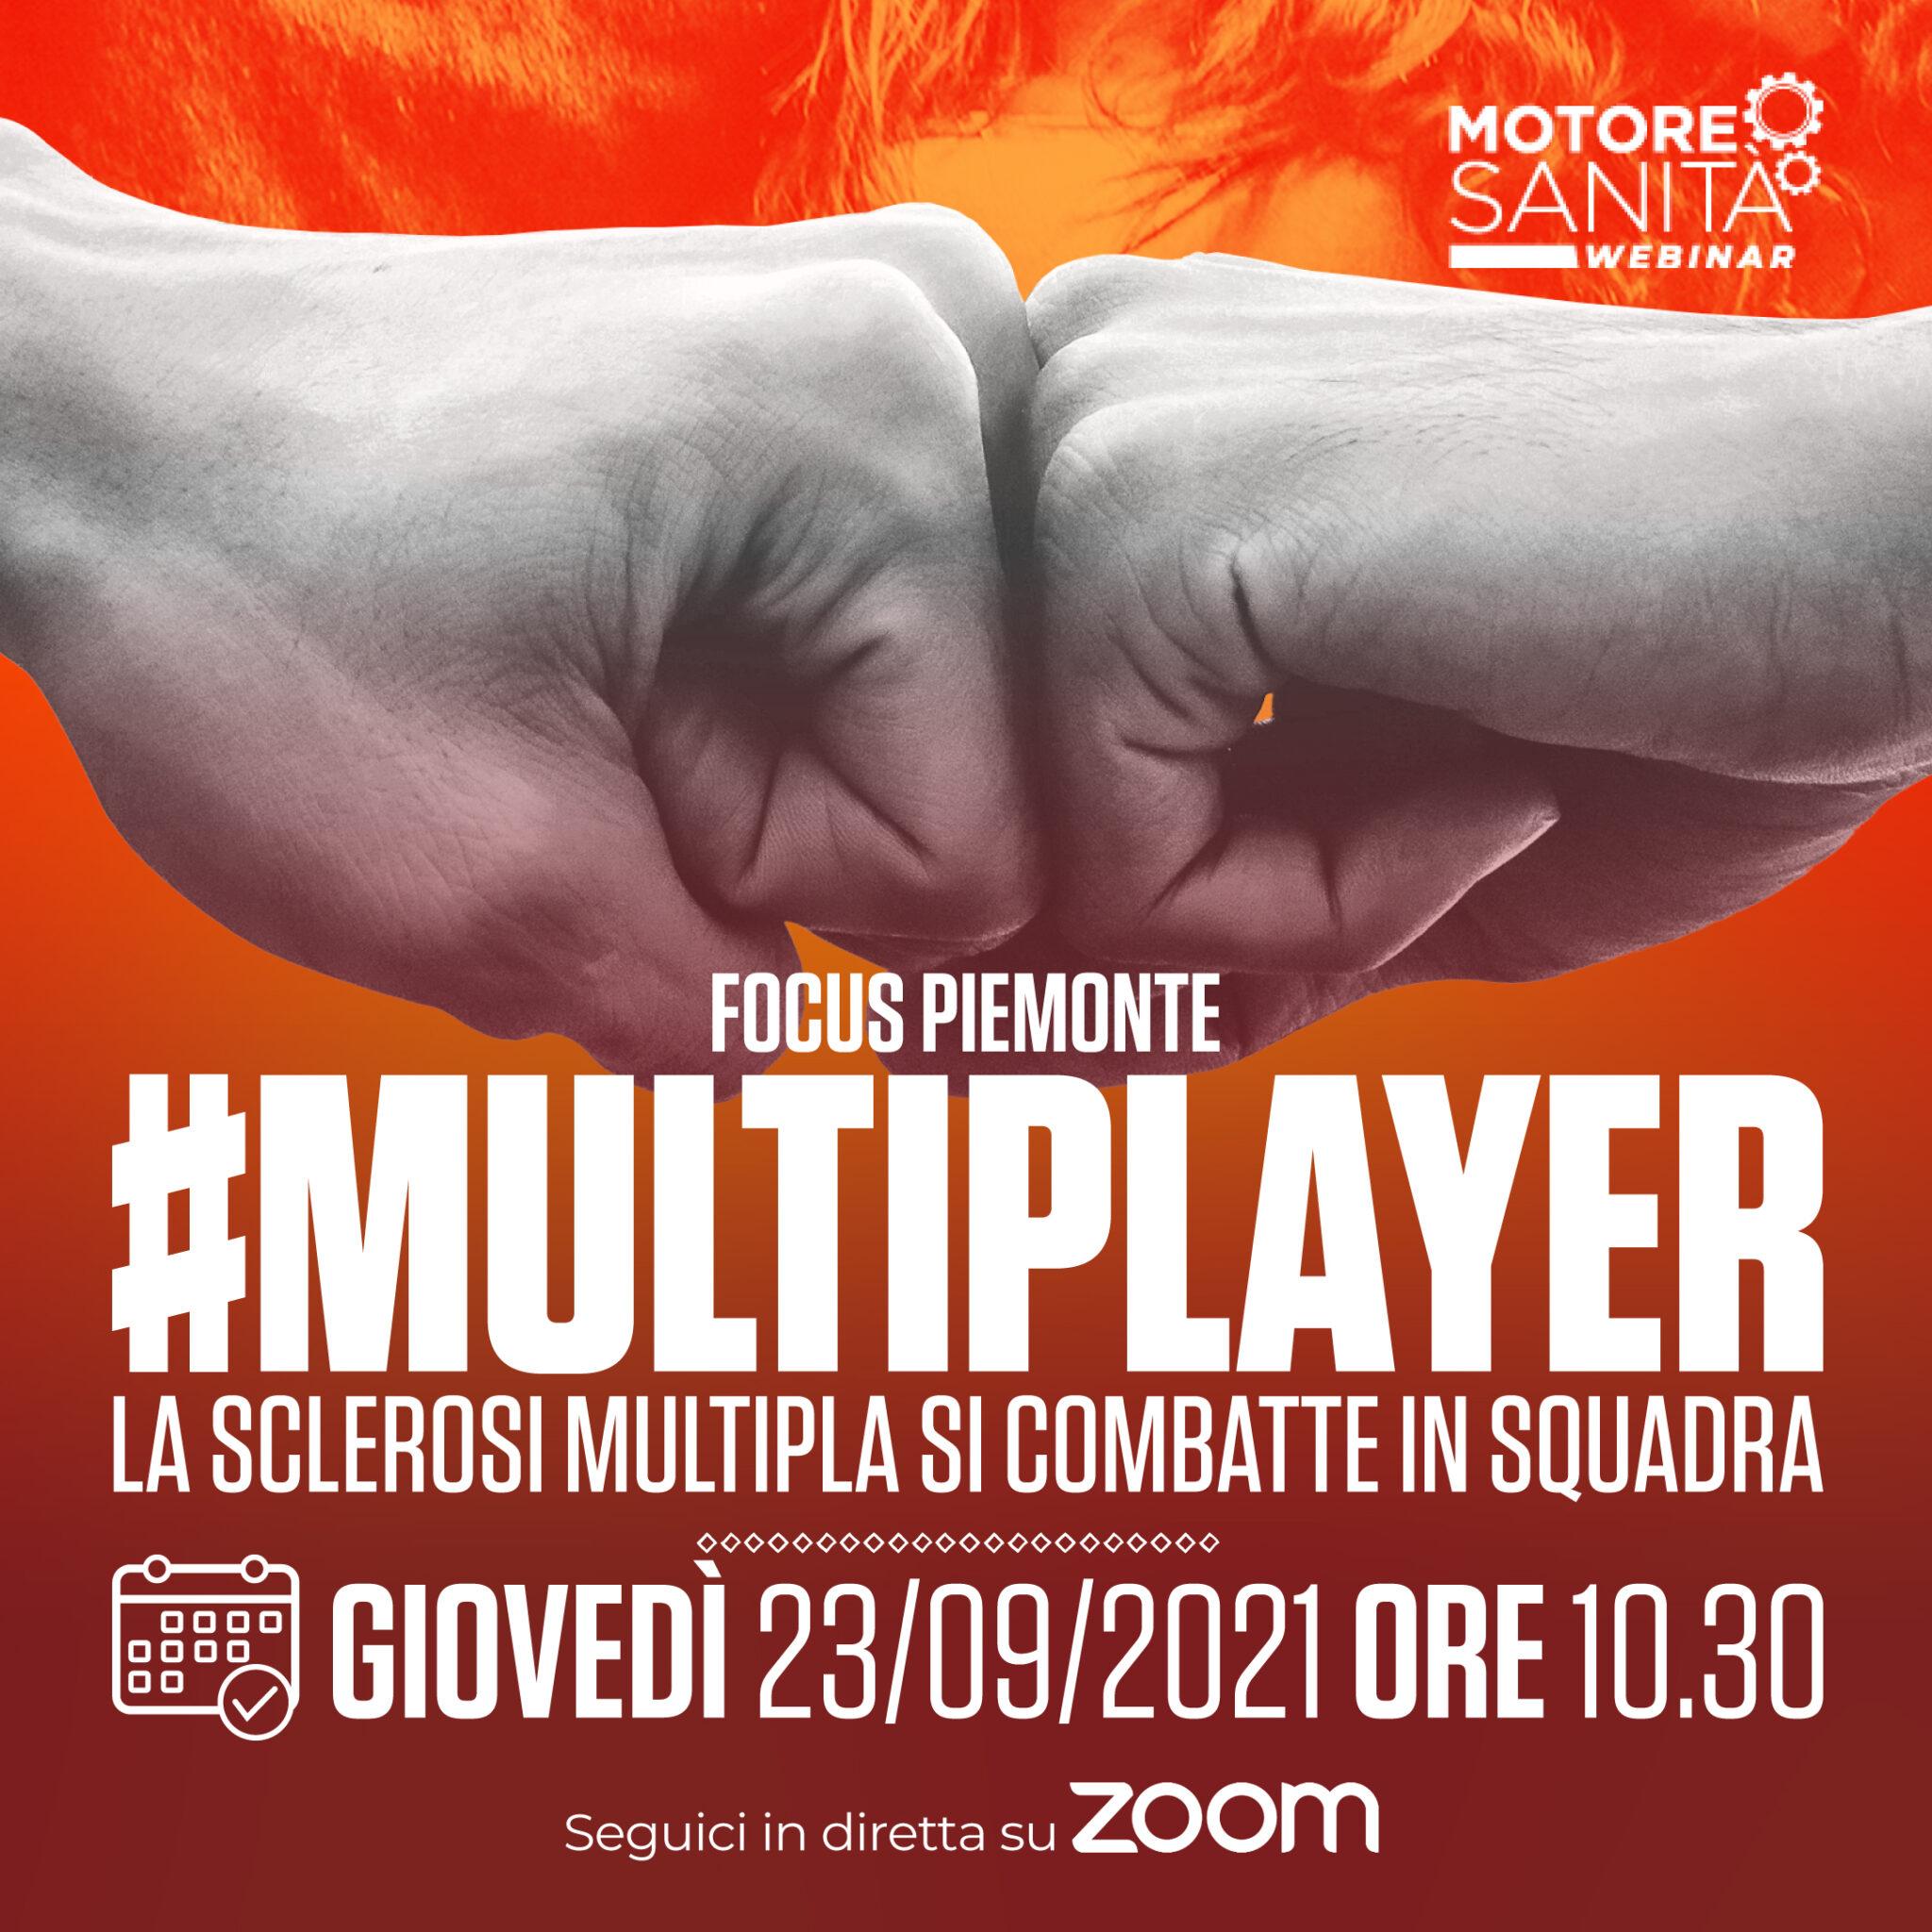 Multiplayer - La sclerosi multipla si combatte in strada